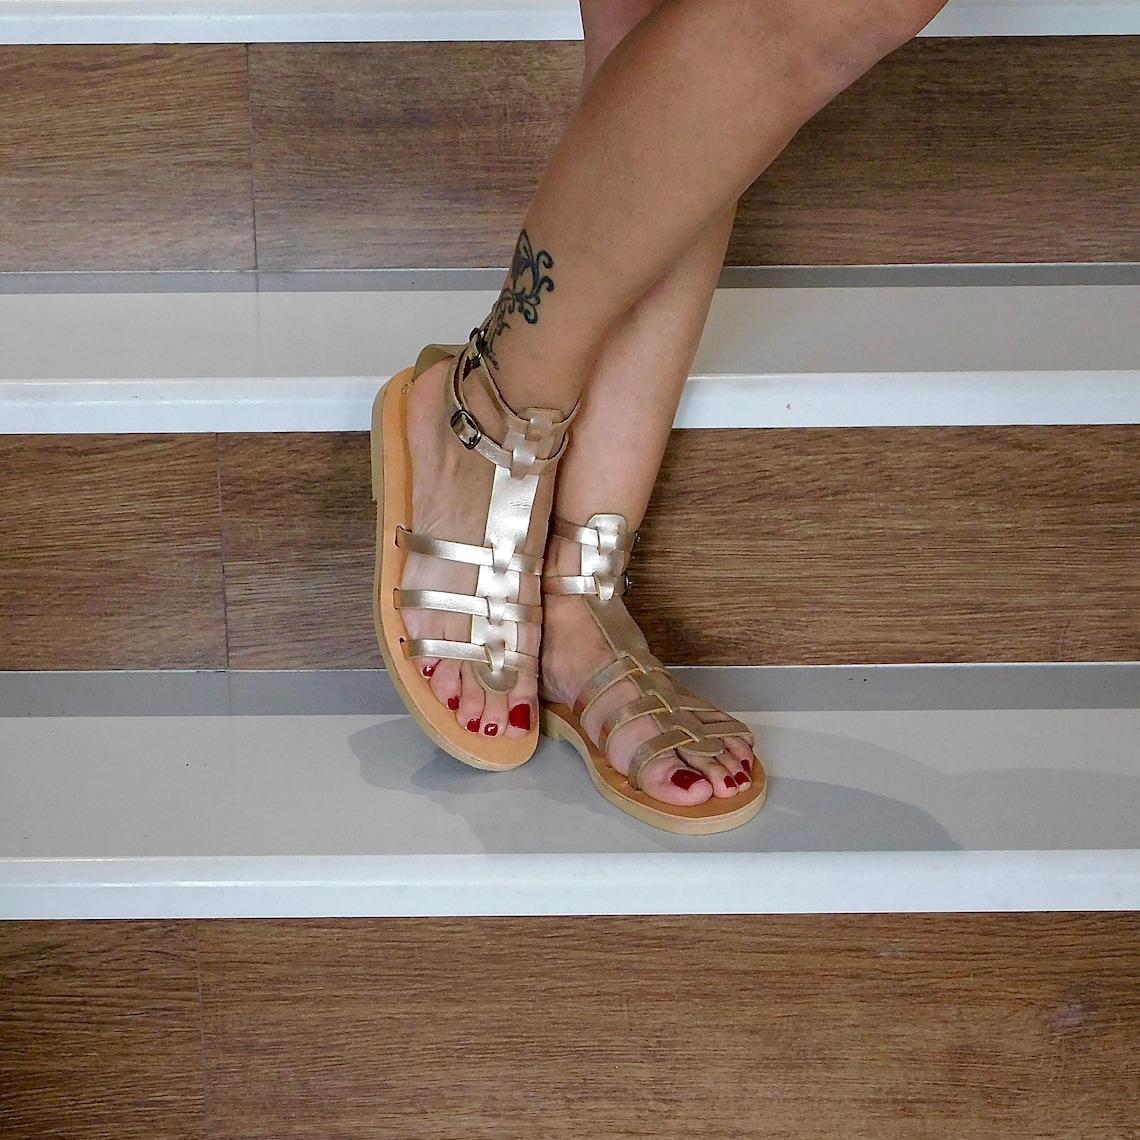 Gladiator sandals, sandals for women, wedding sandals, ankle straps sandals, metallic sandals, greek sandals, leather shoes, flat shoes